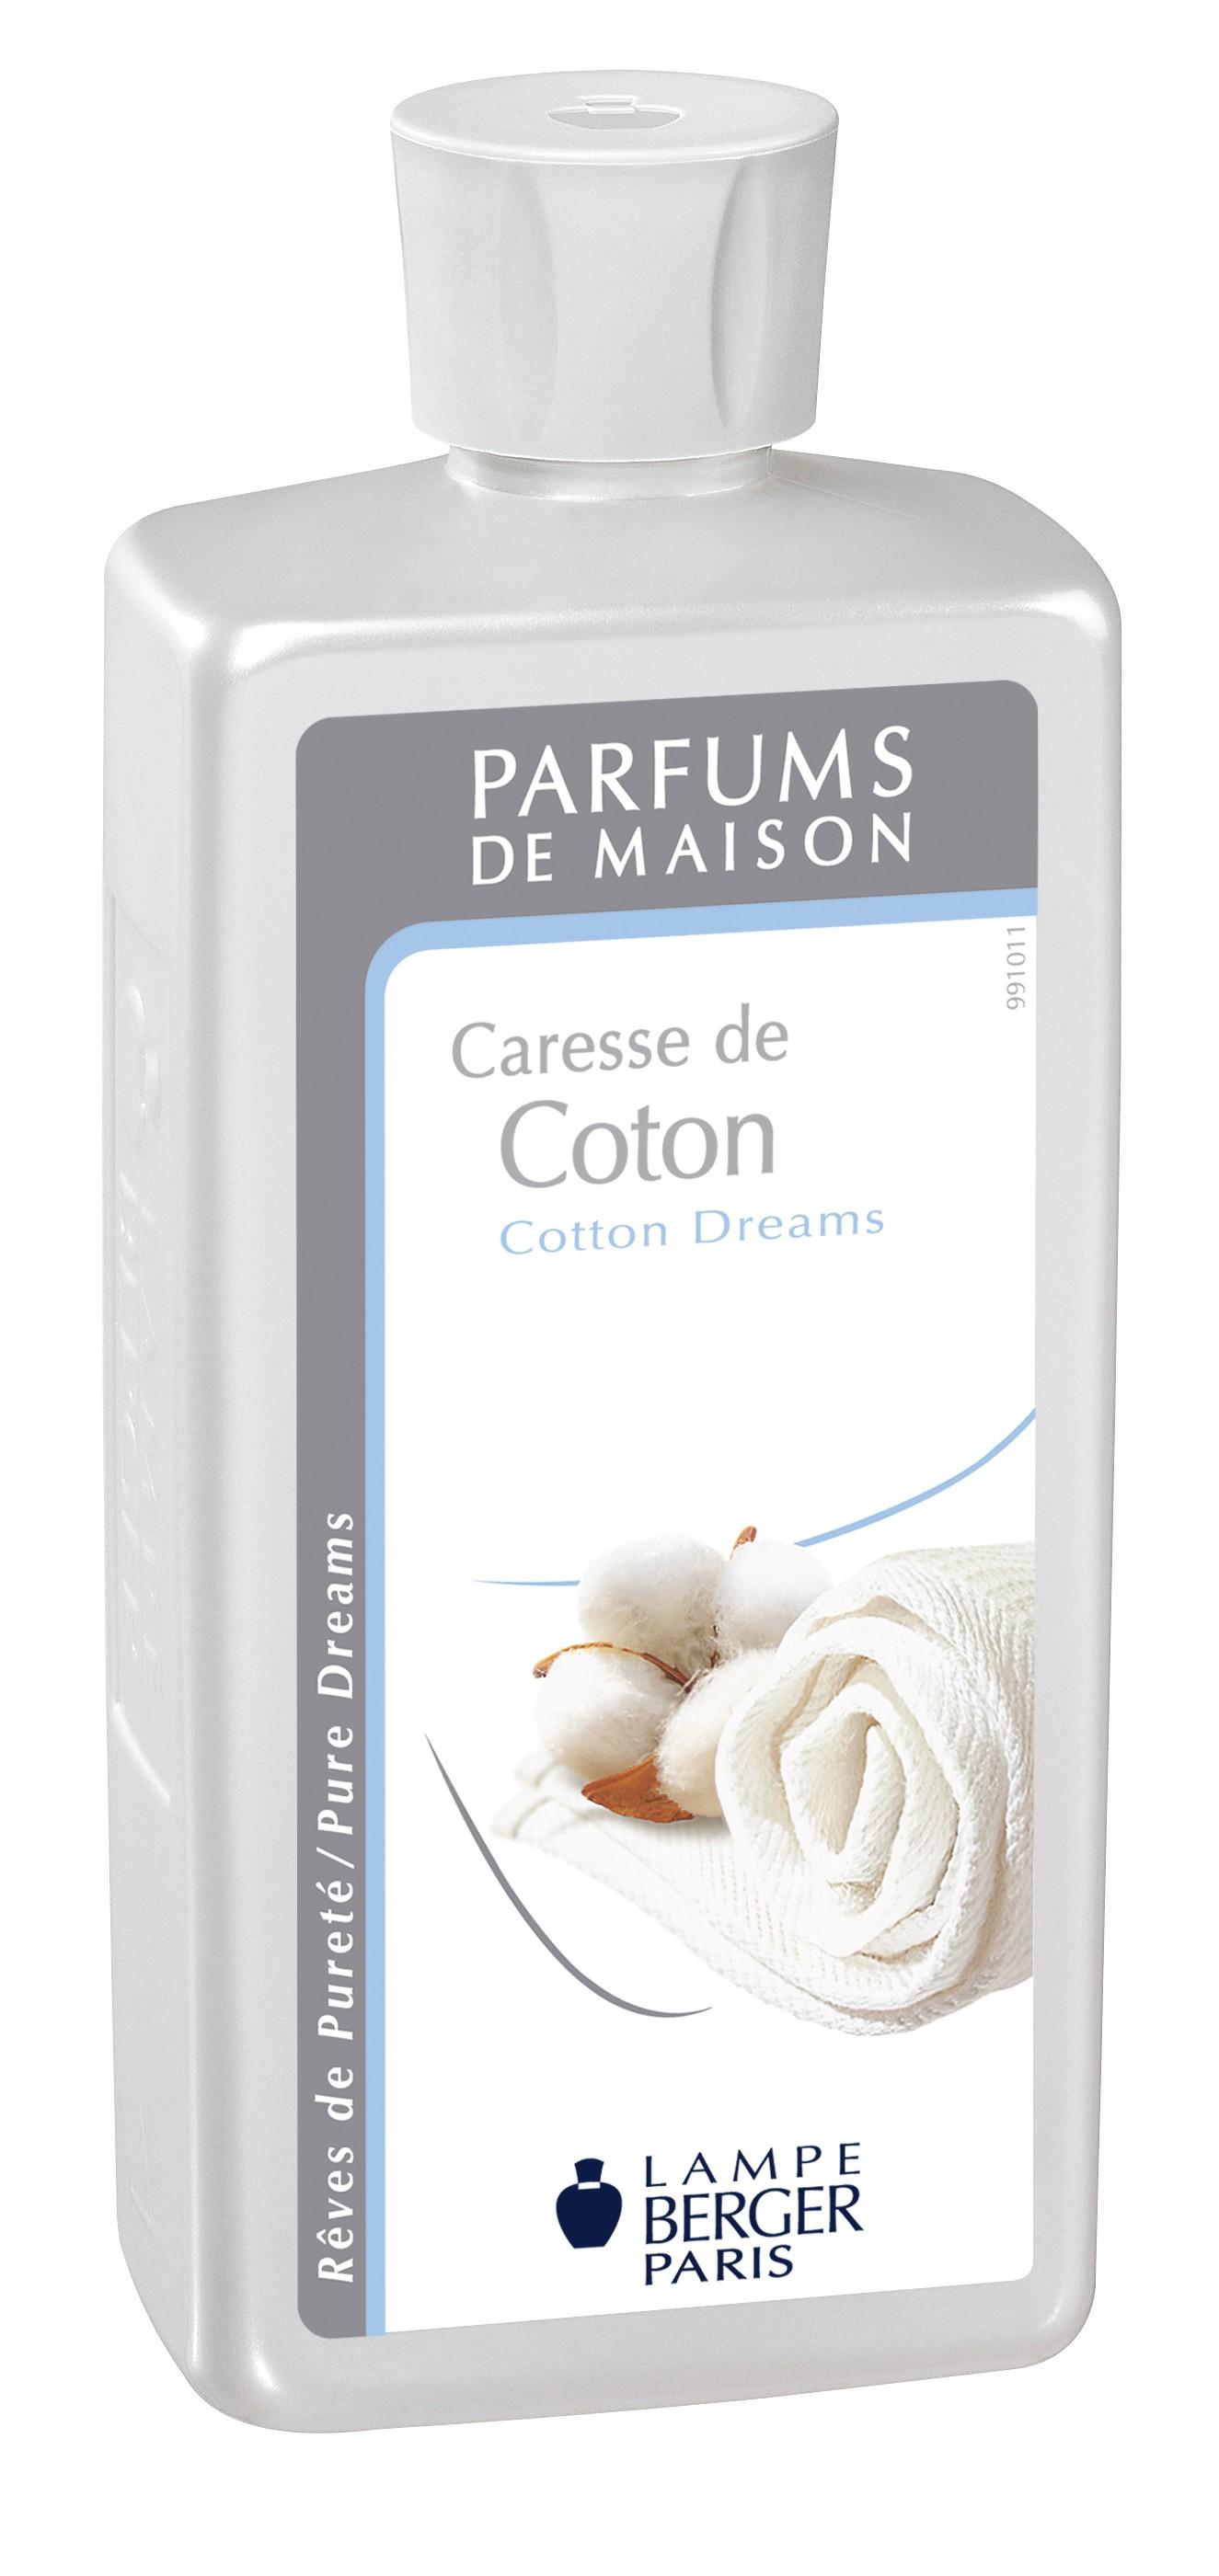 Caresse de Coton